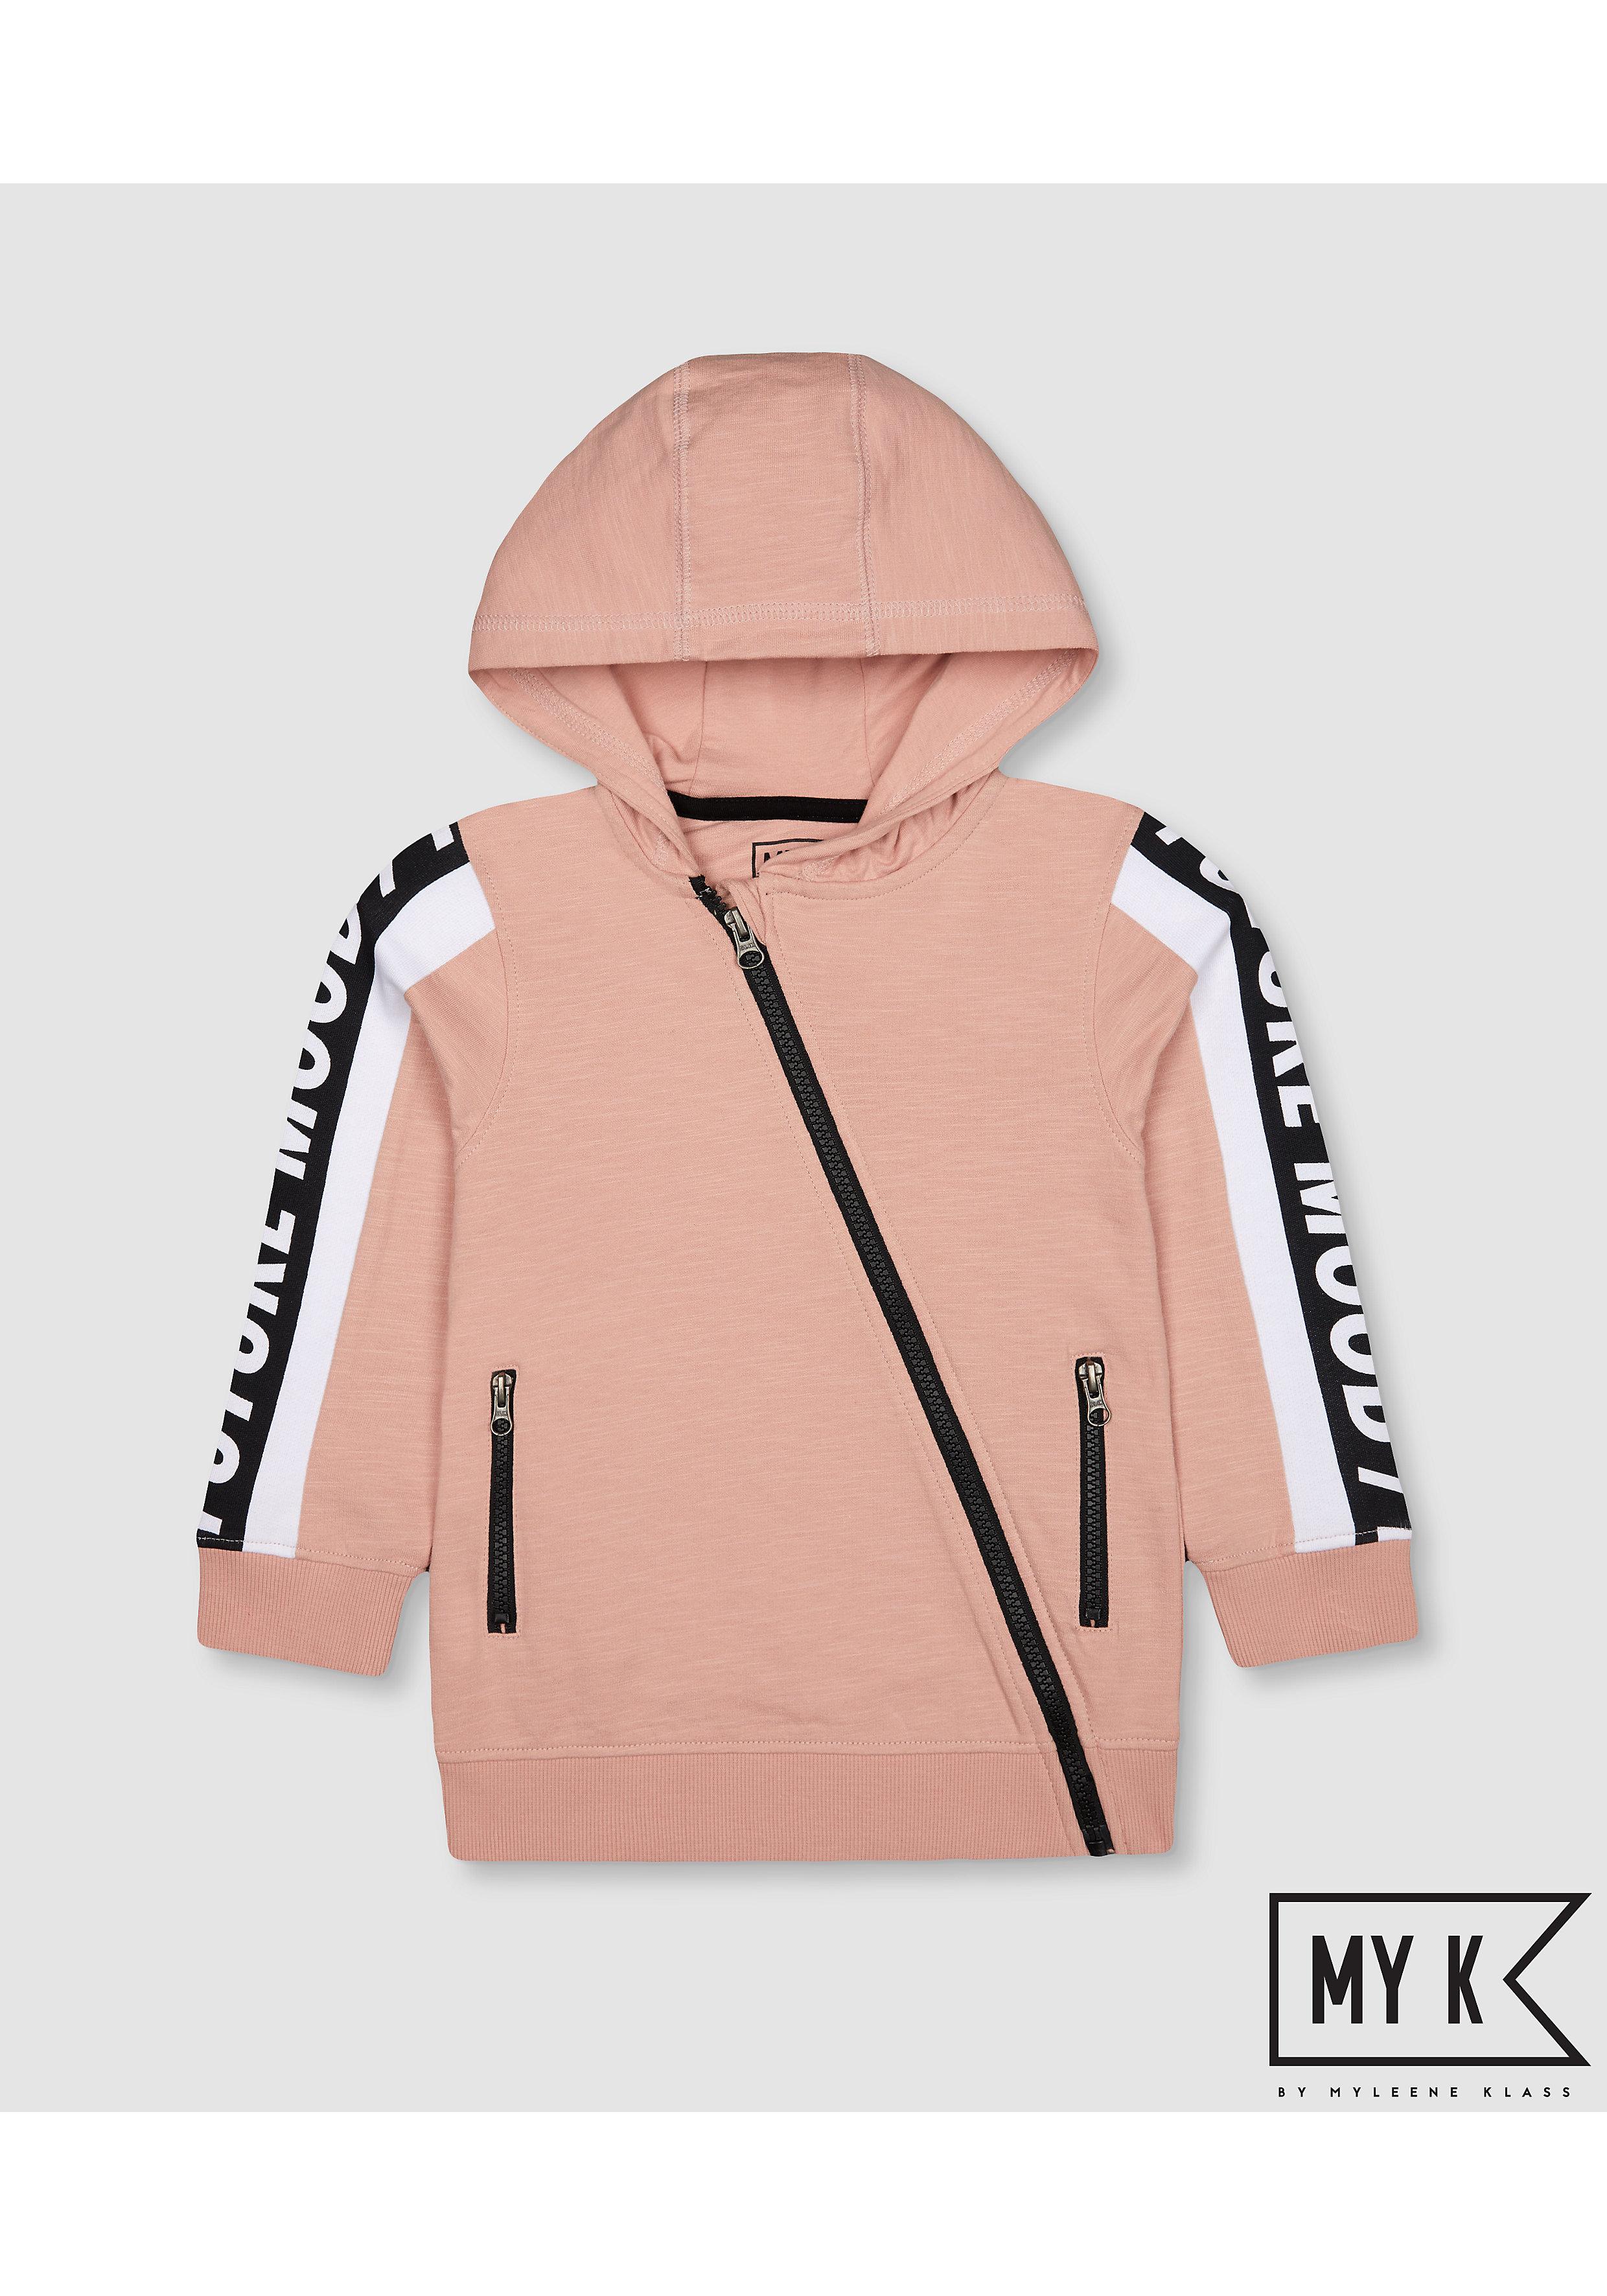 Mothercare | Boys Full Sleeves Sweatshirt Text Print - Pink